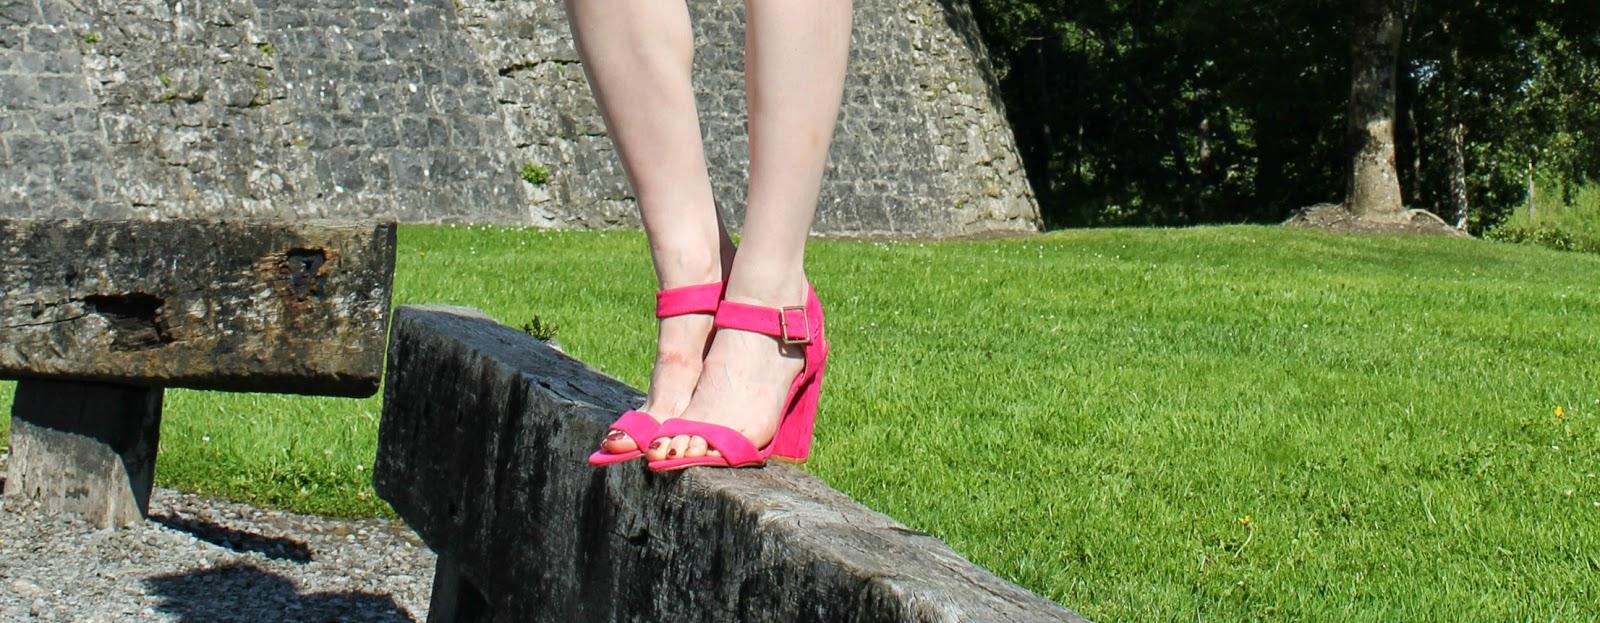 Pink Primark sandals